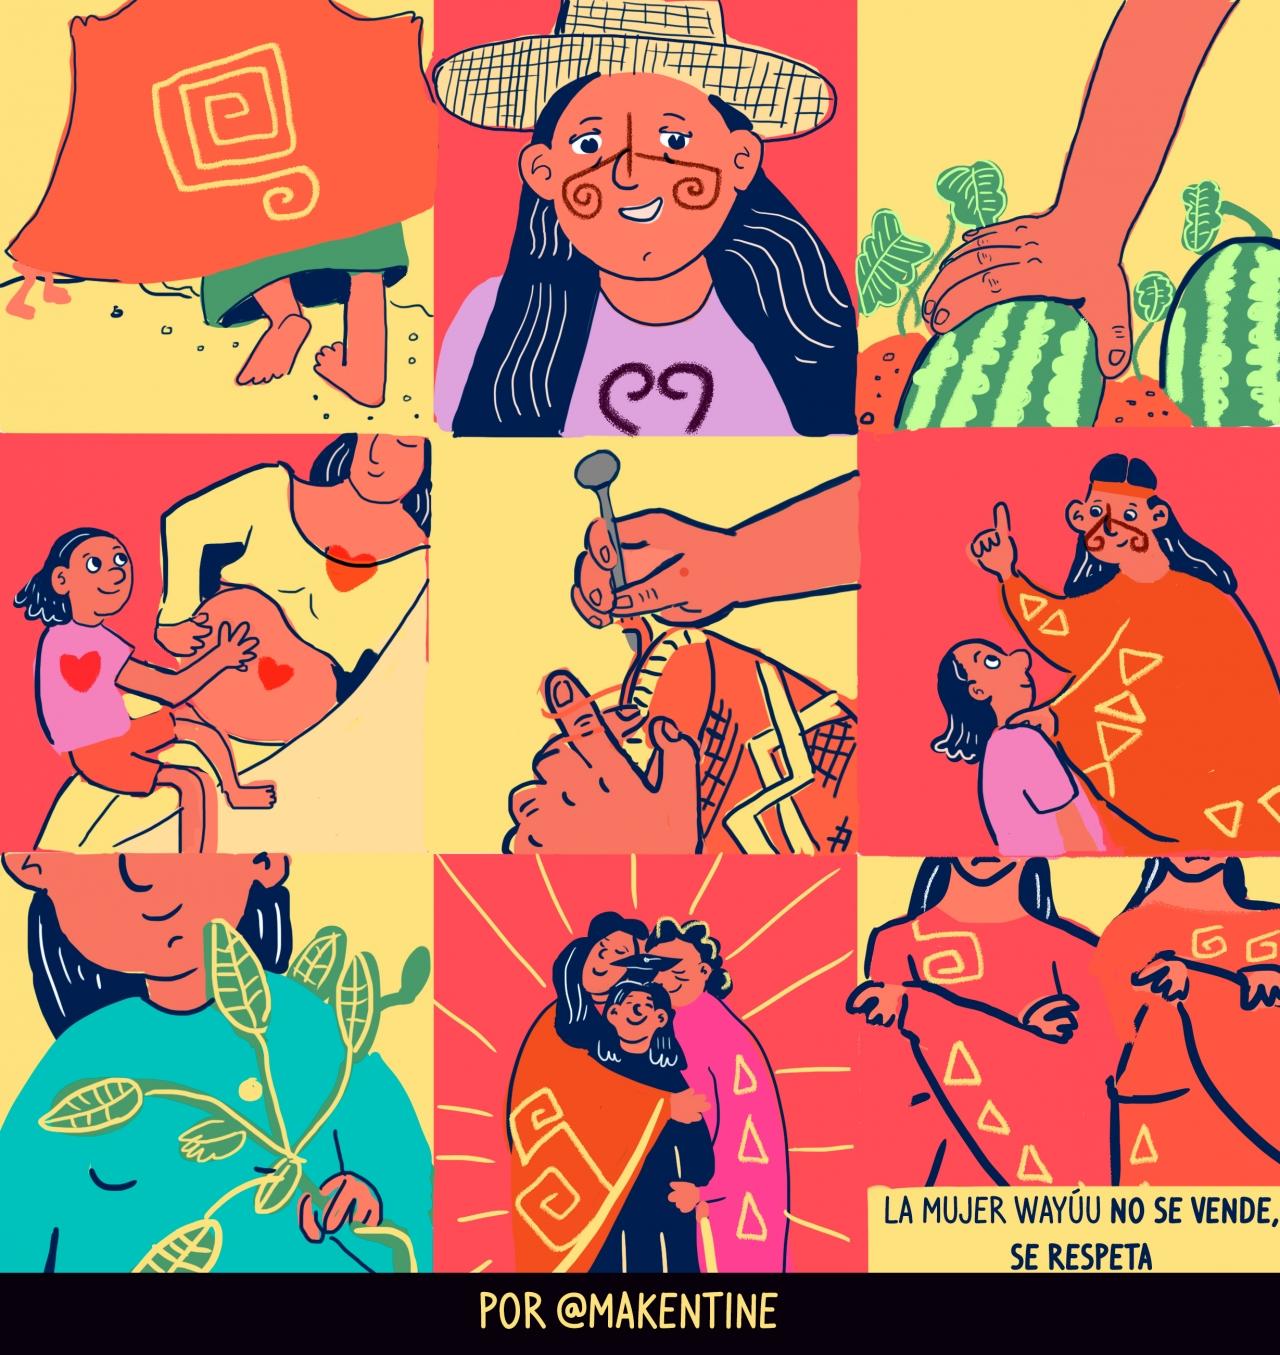 La mujer wayúu no se vende, se respeta